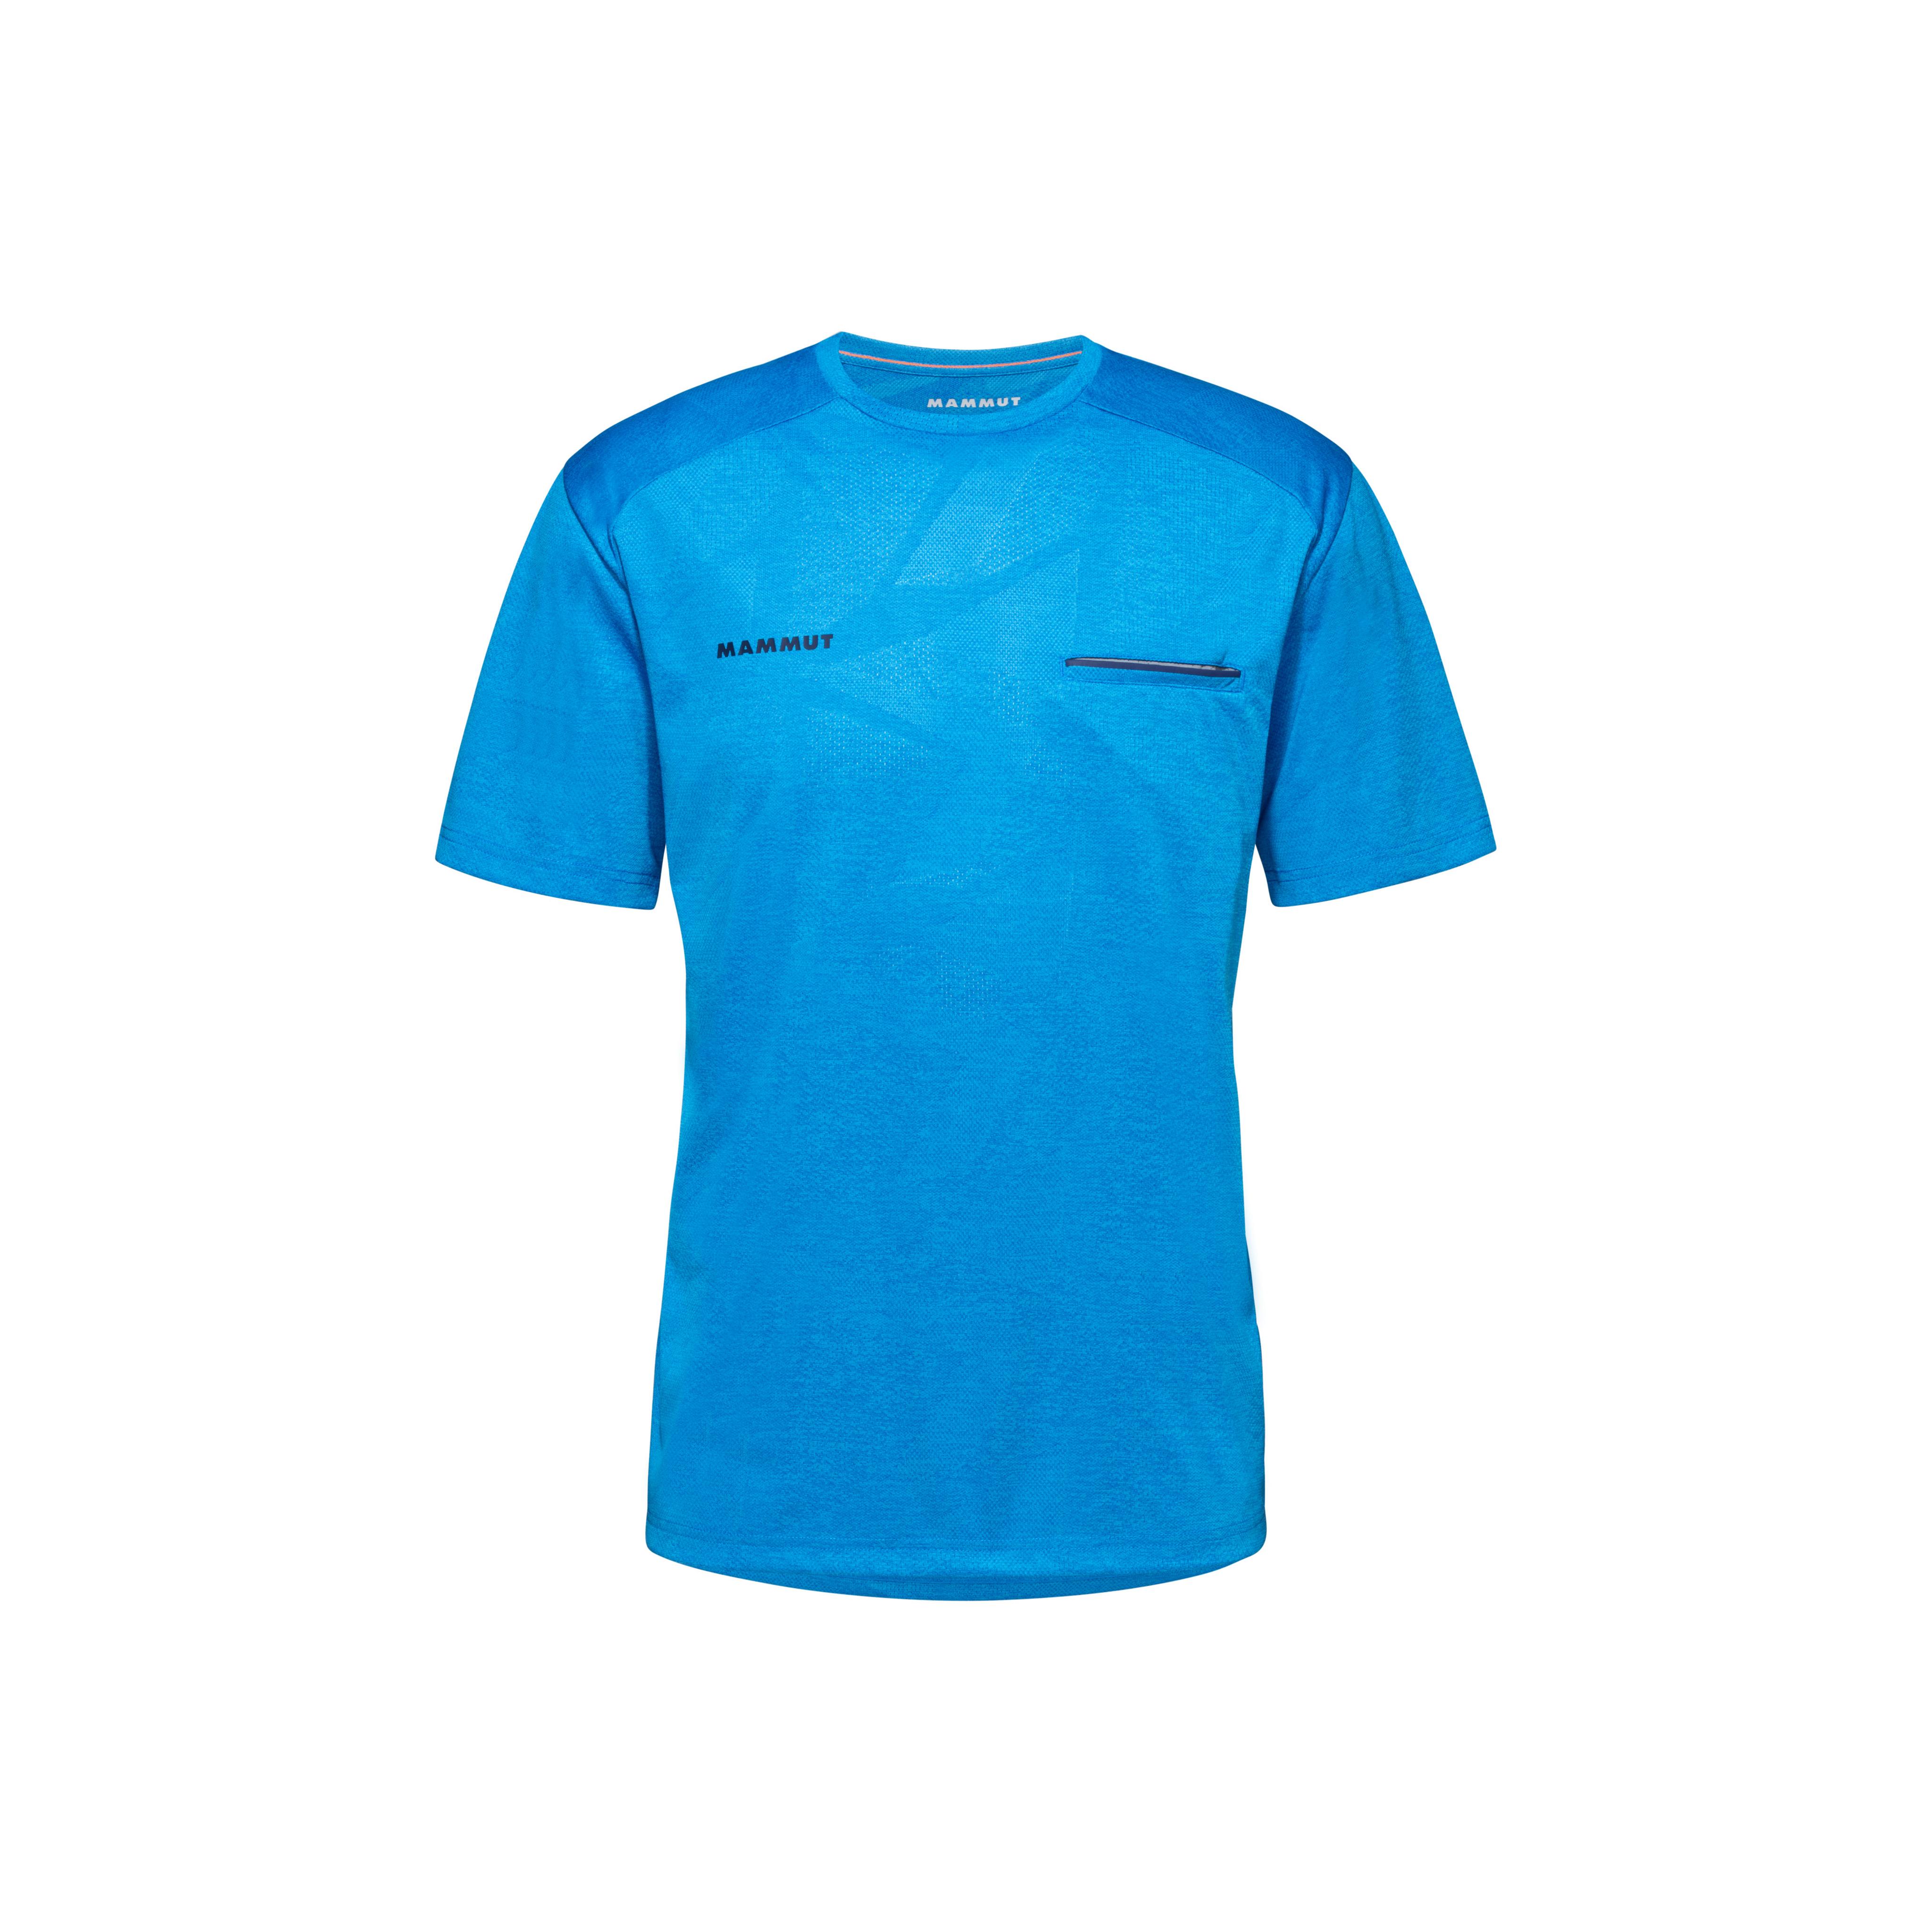 Crashiano T-Shirt Men - gentian melange, S thumbnail